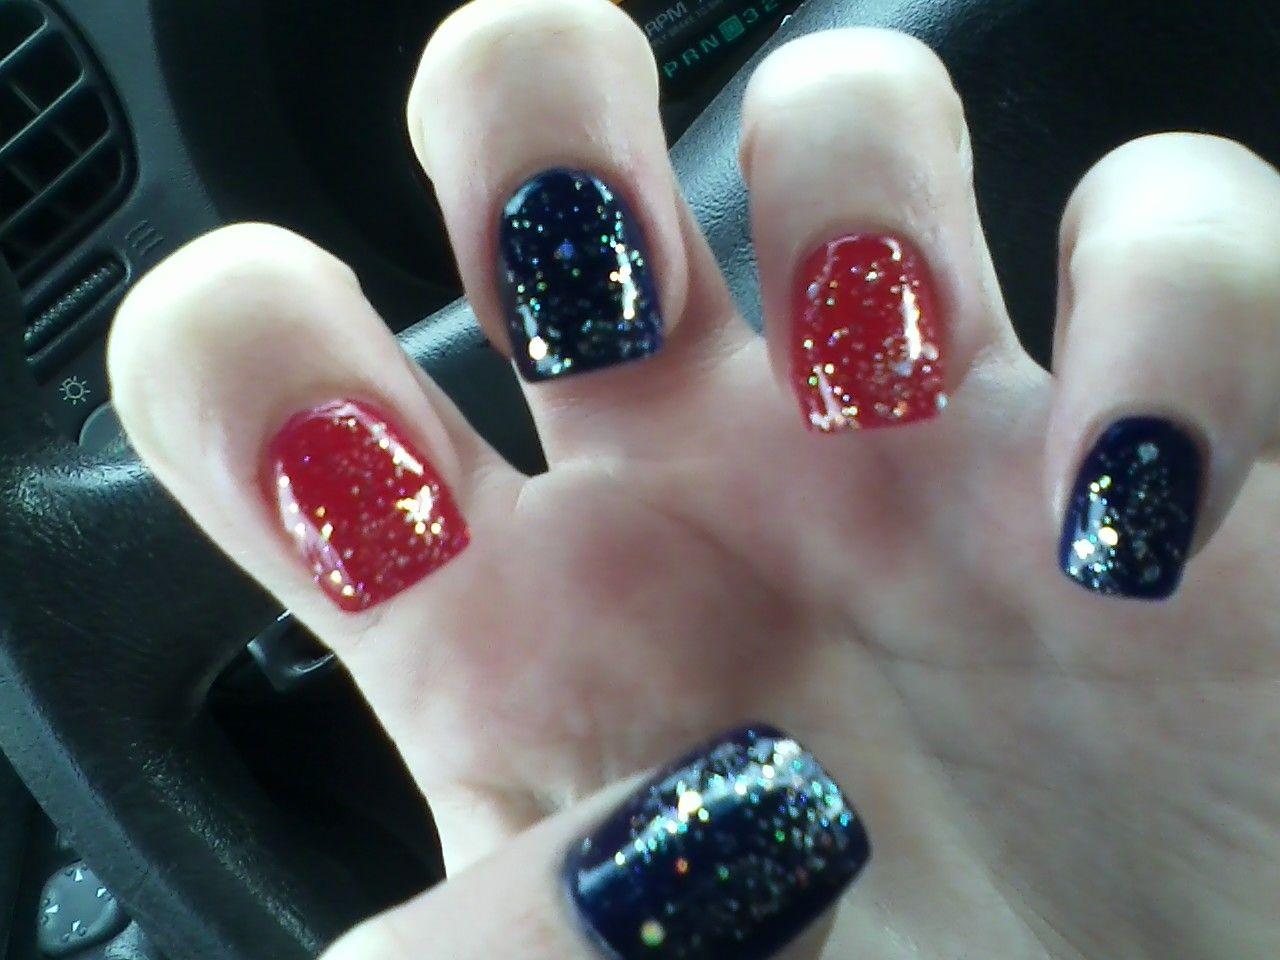 My Fourth of July nails - Lv Nails in Arlington   Nails   Pinterest